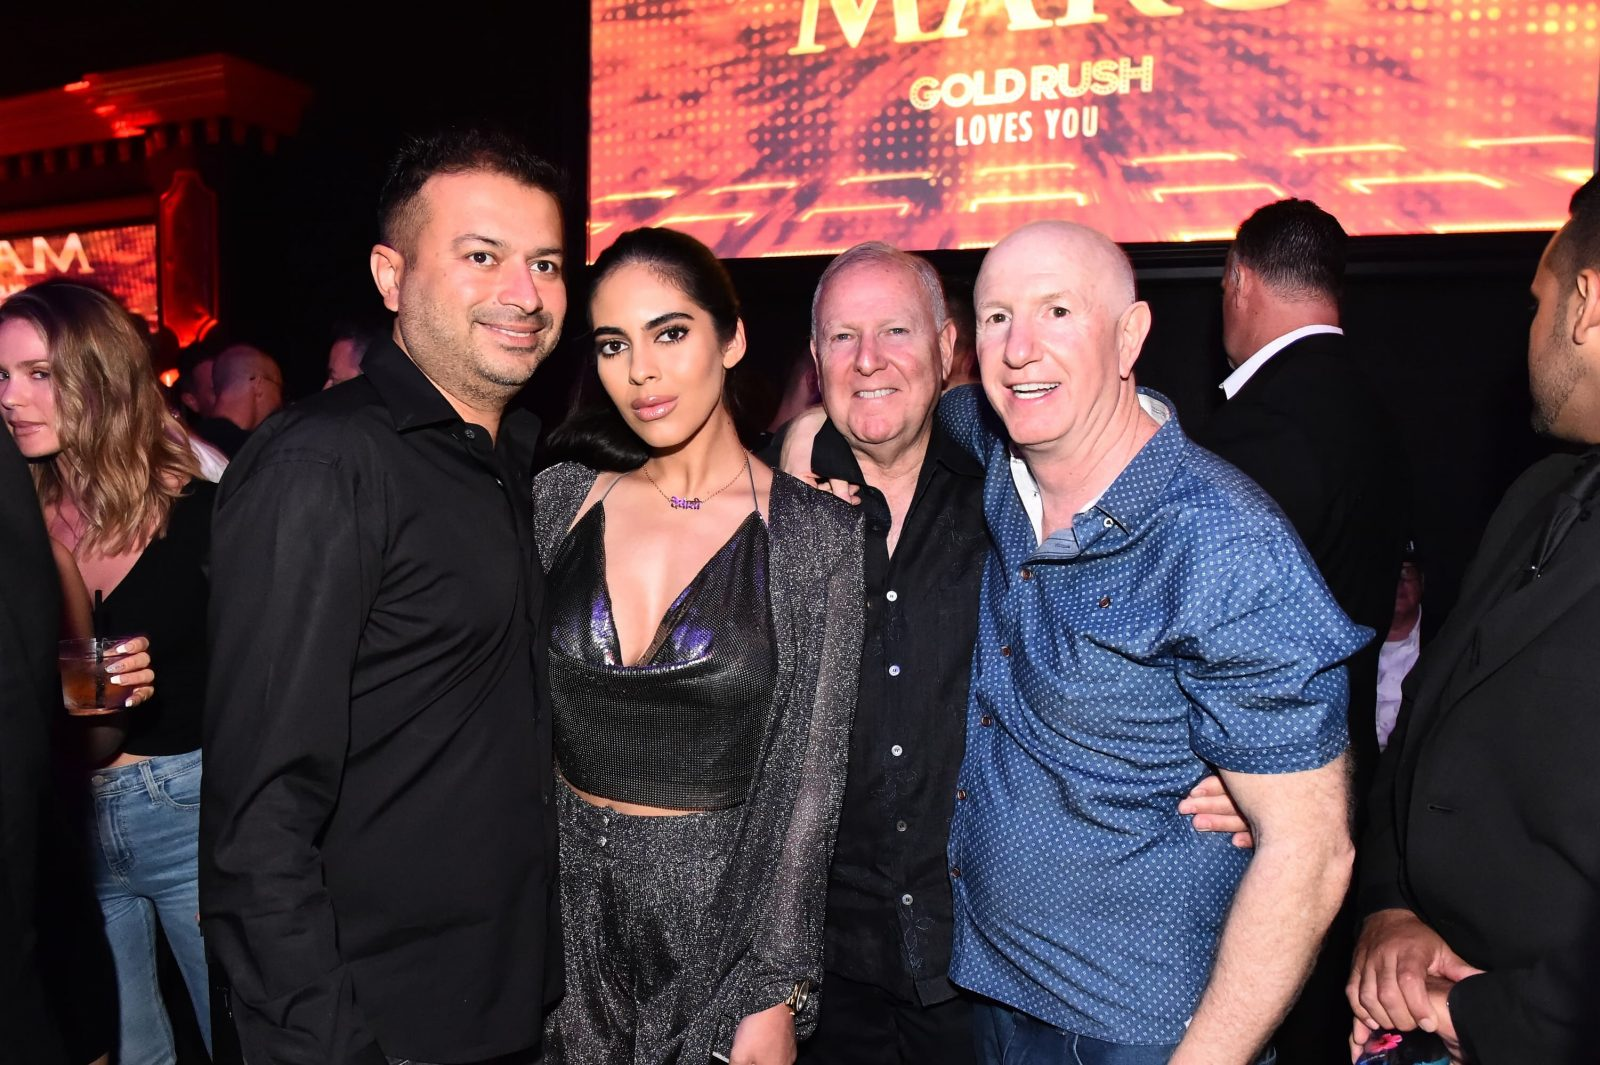 Kamal Hotchandani, Deyvanshi Masrani, Steven Elliman, Marc Roberts